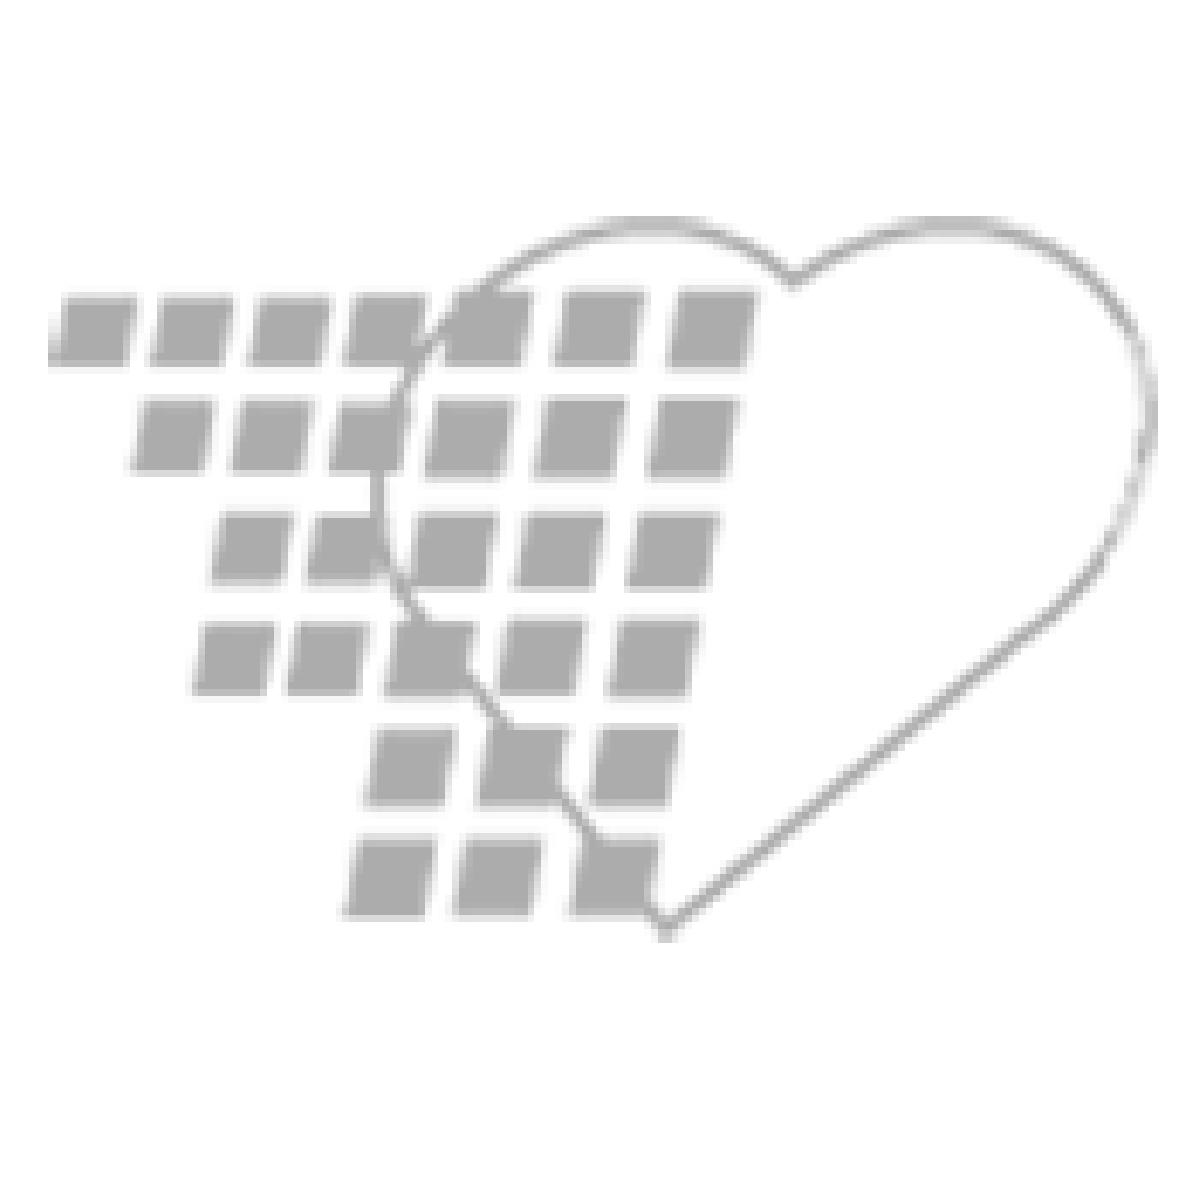 09-31-9998 Understanding Skin Cancer Chart